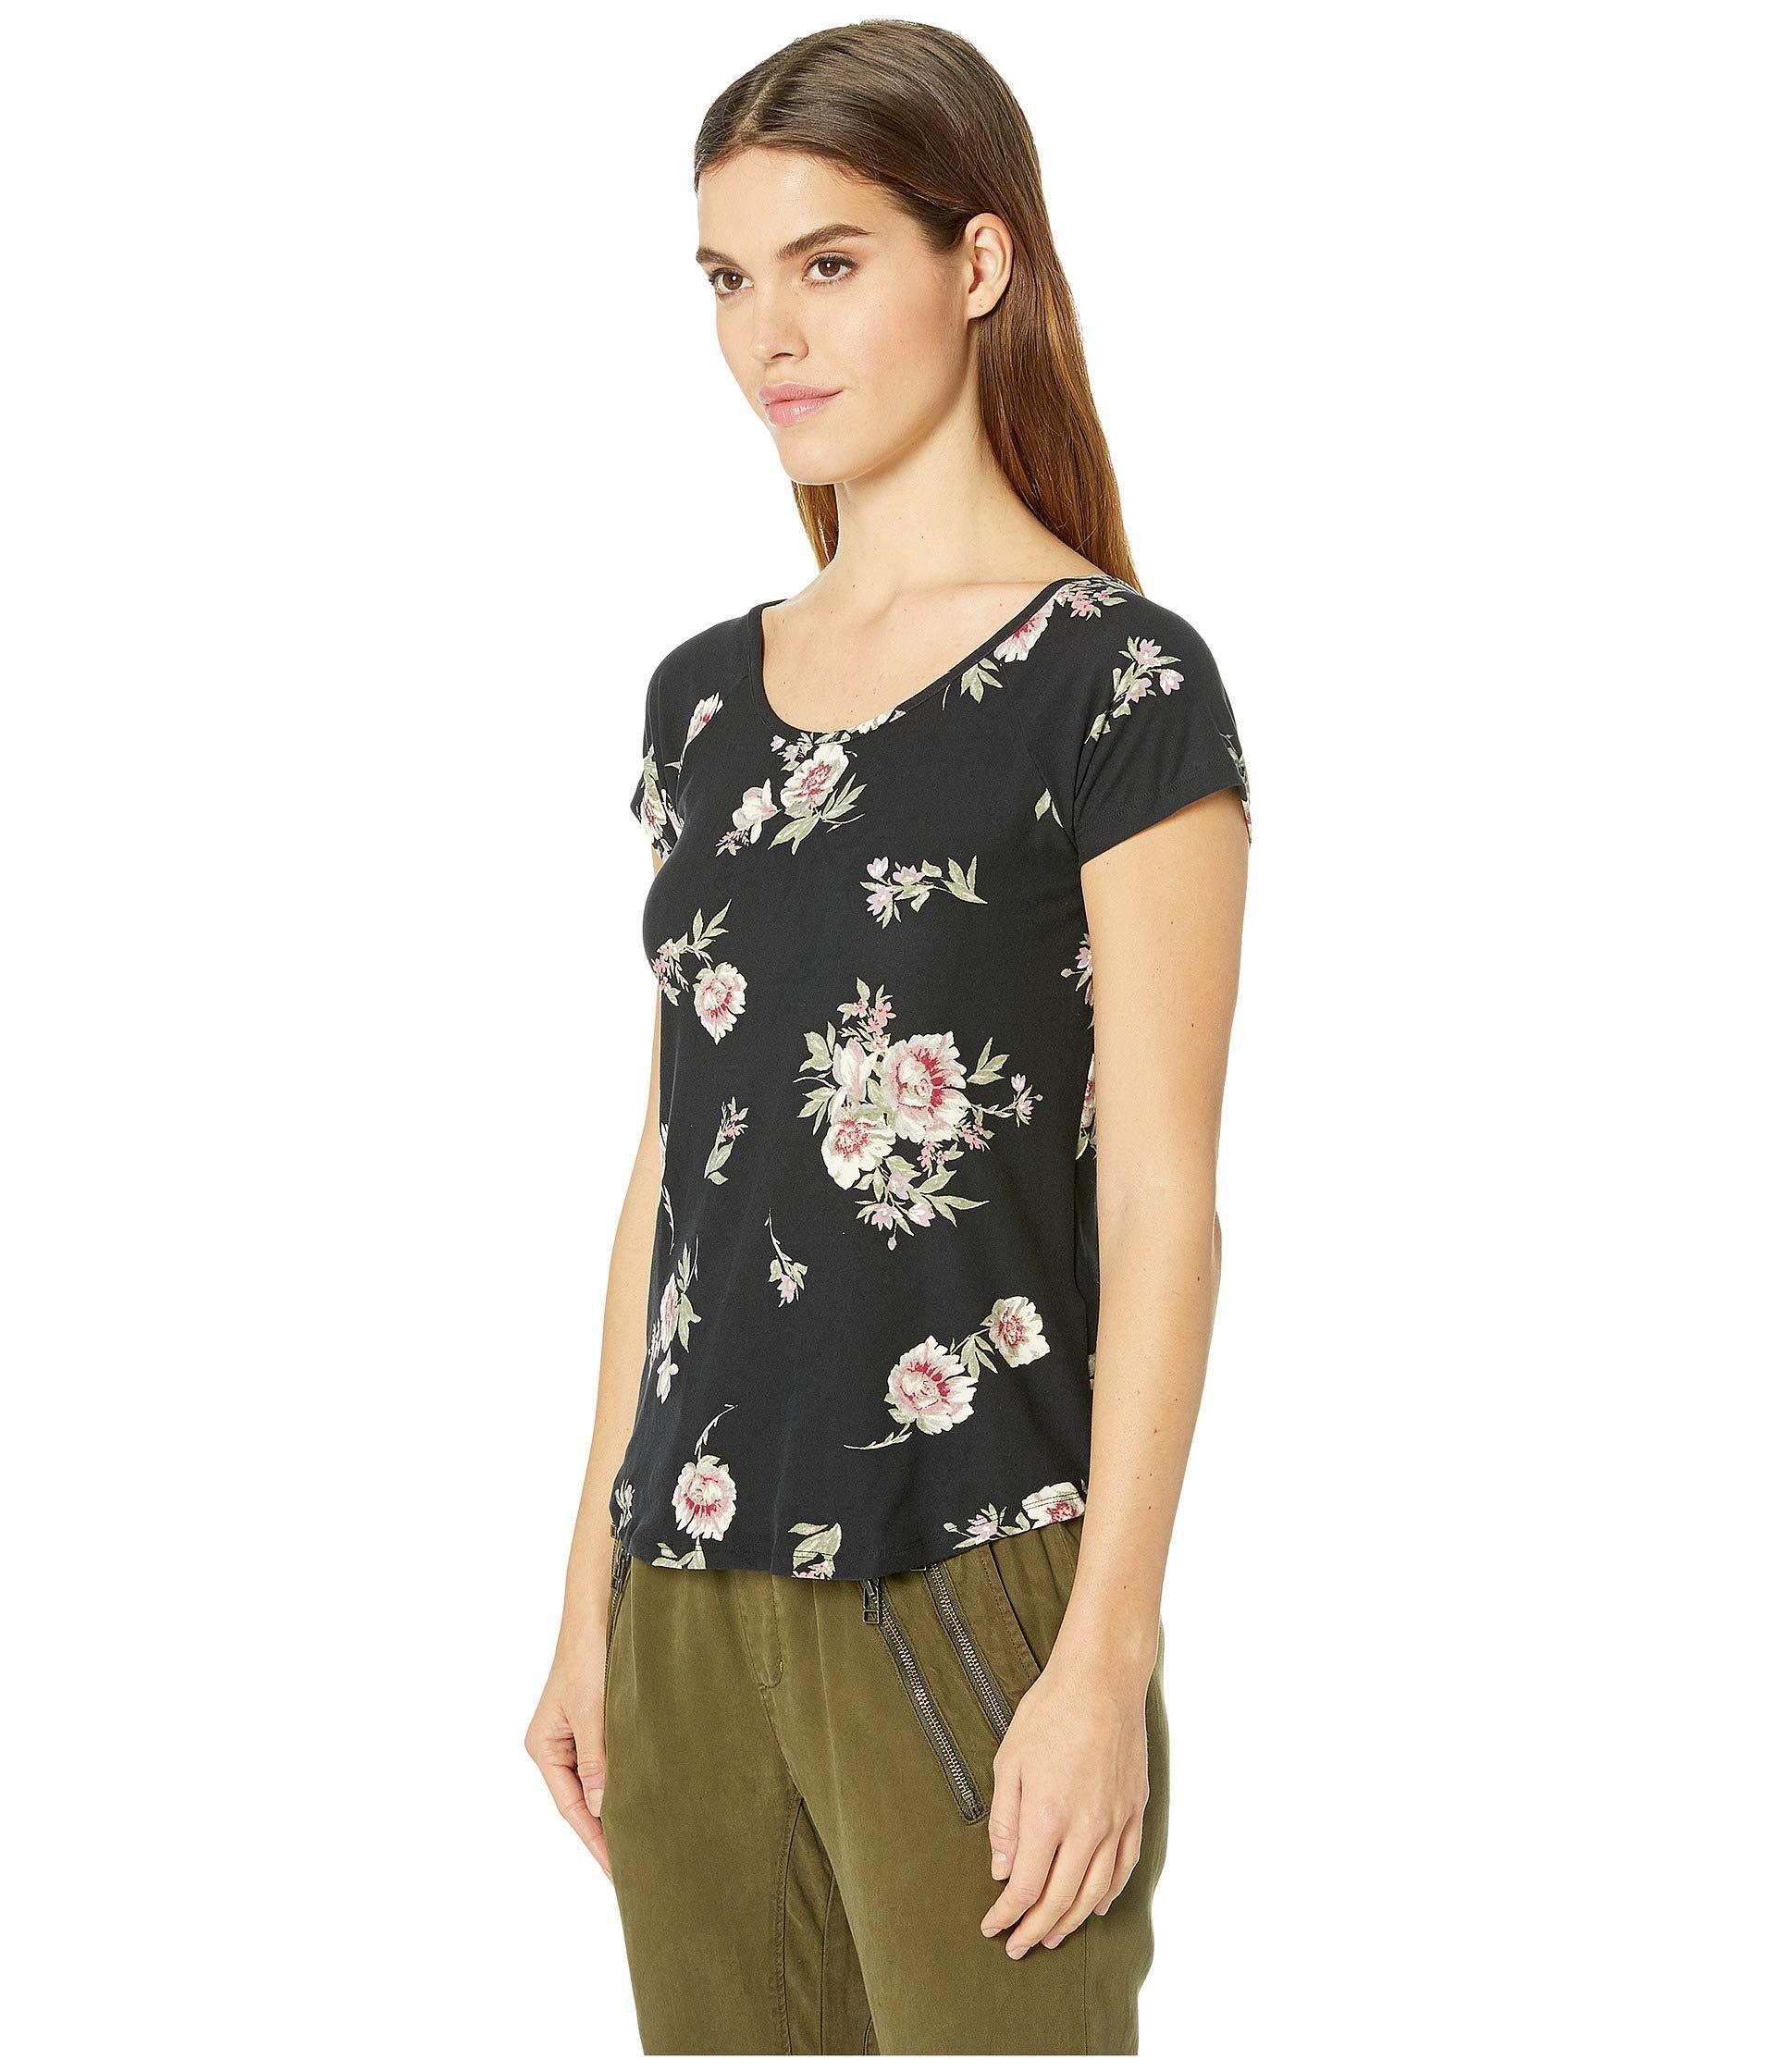 48e3f5d1053 Lyst - Pink Rose Raglan Short Sleeve Shirttail Top W  Back Double  Crisscross in Black